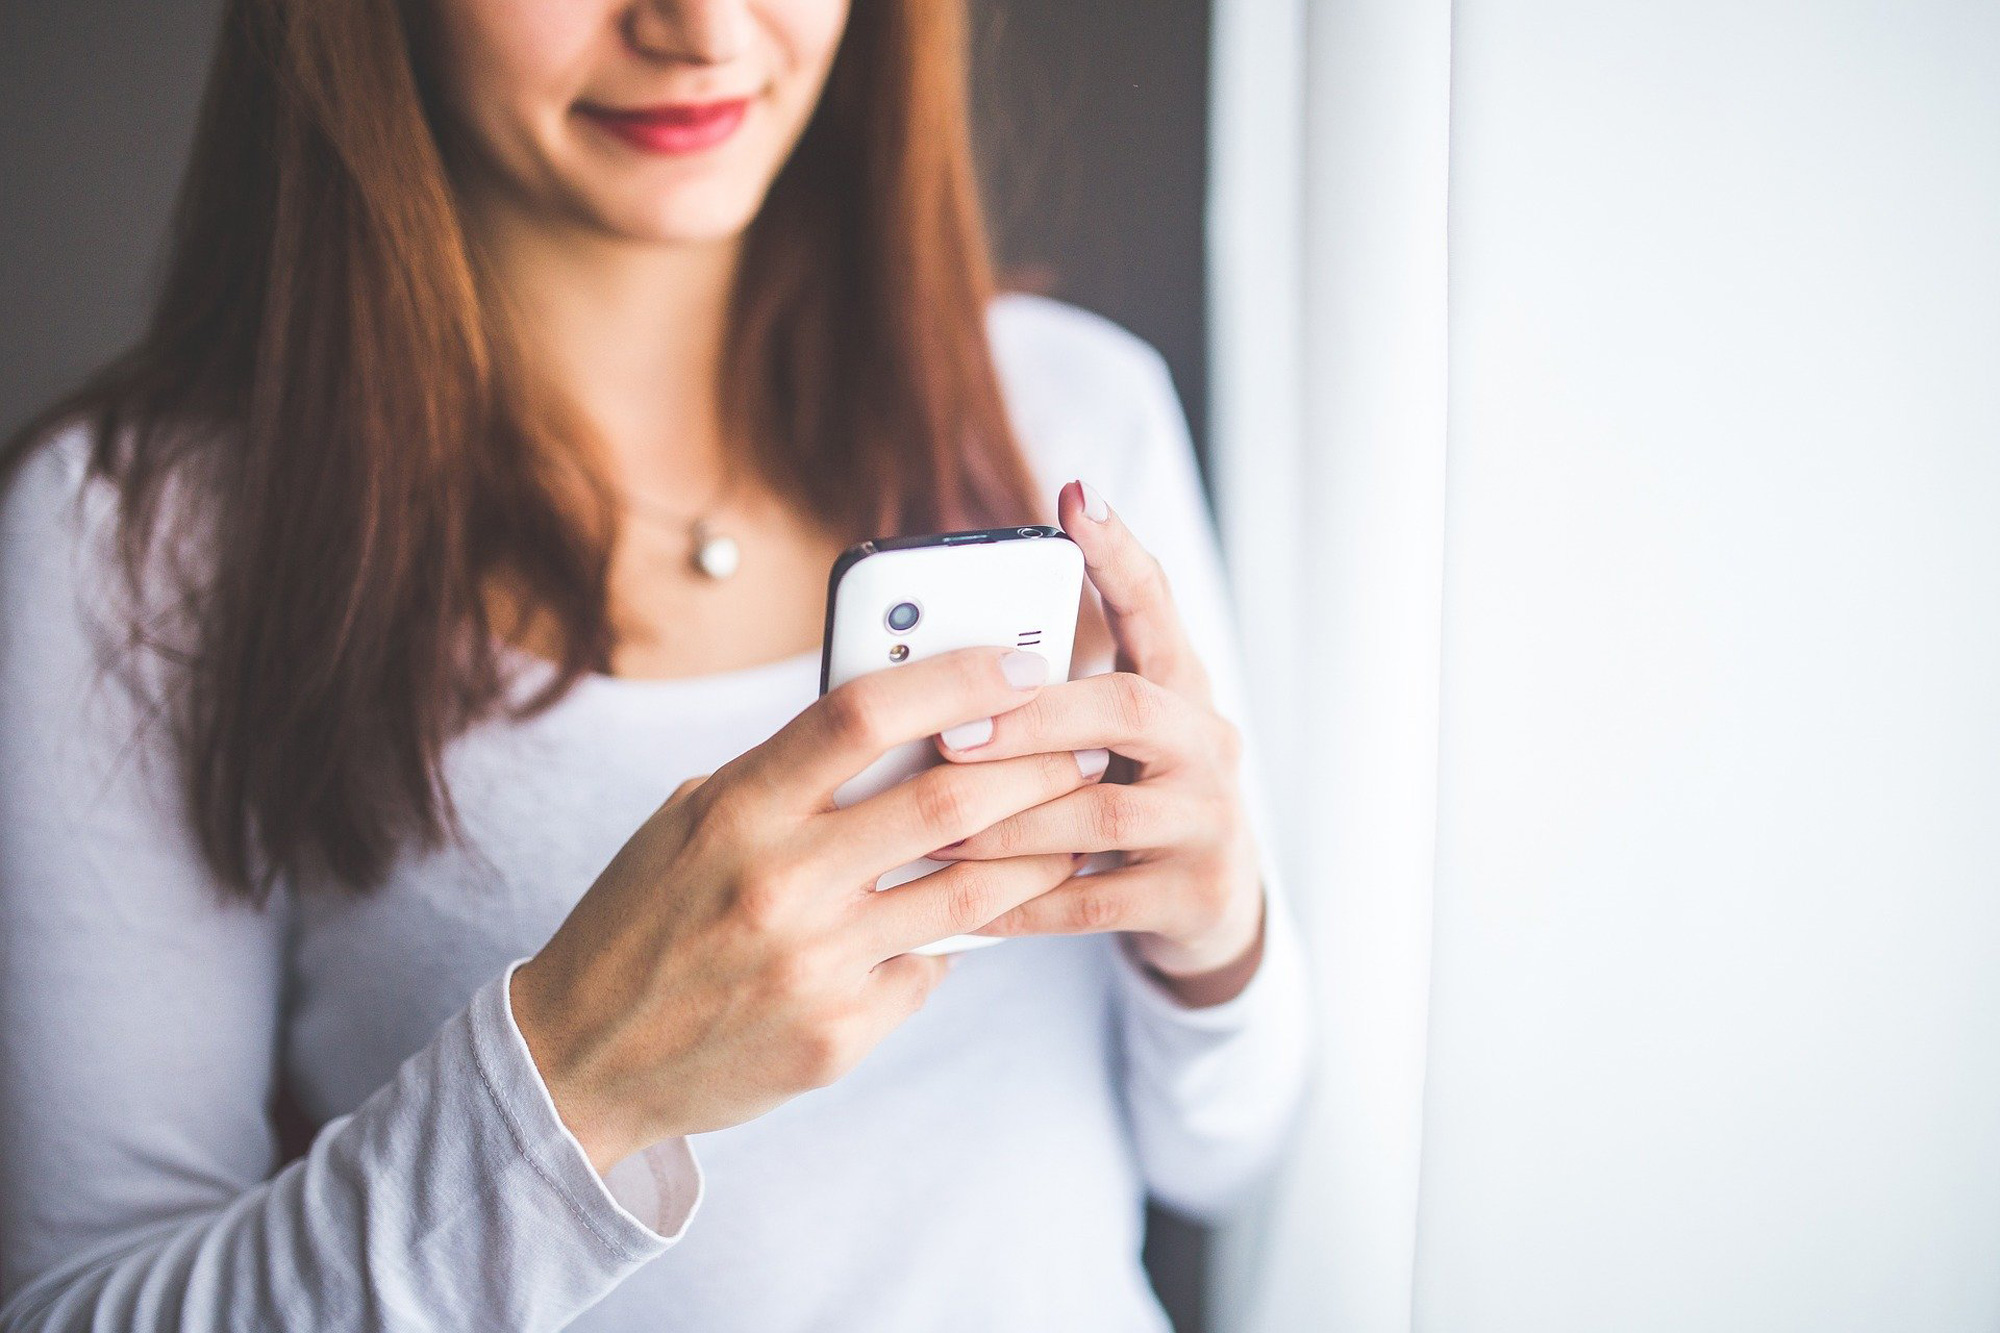 frau macht video id per smartphone